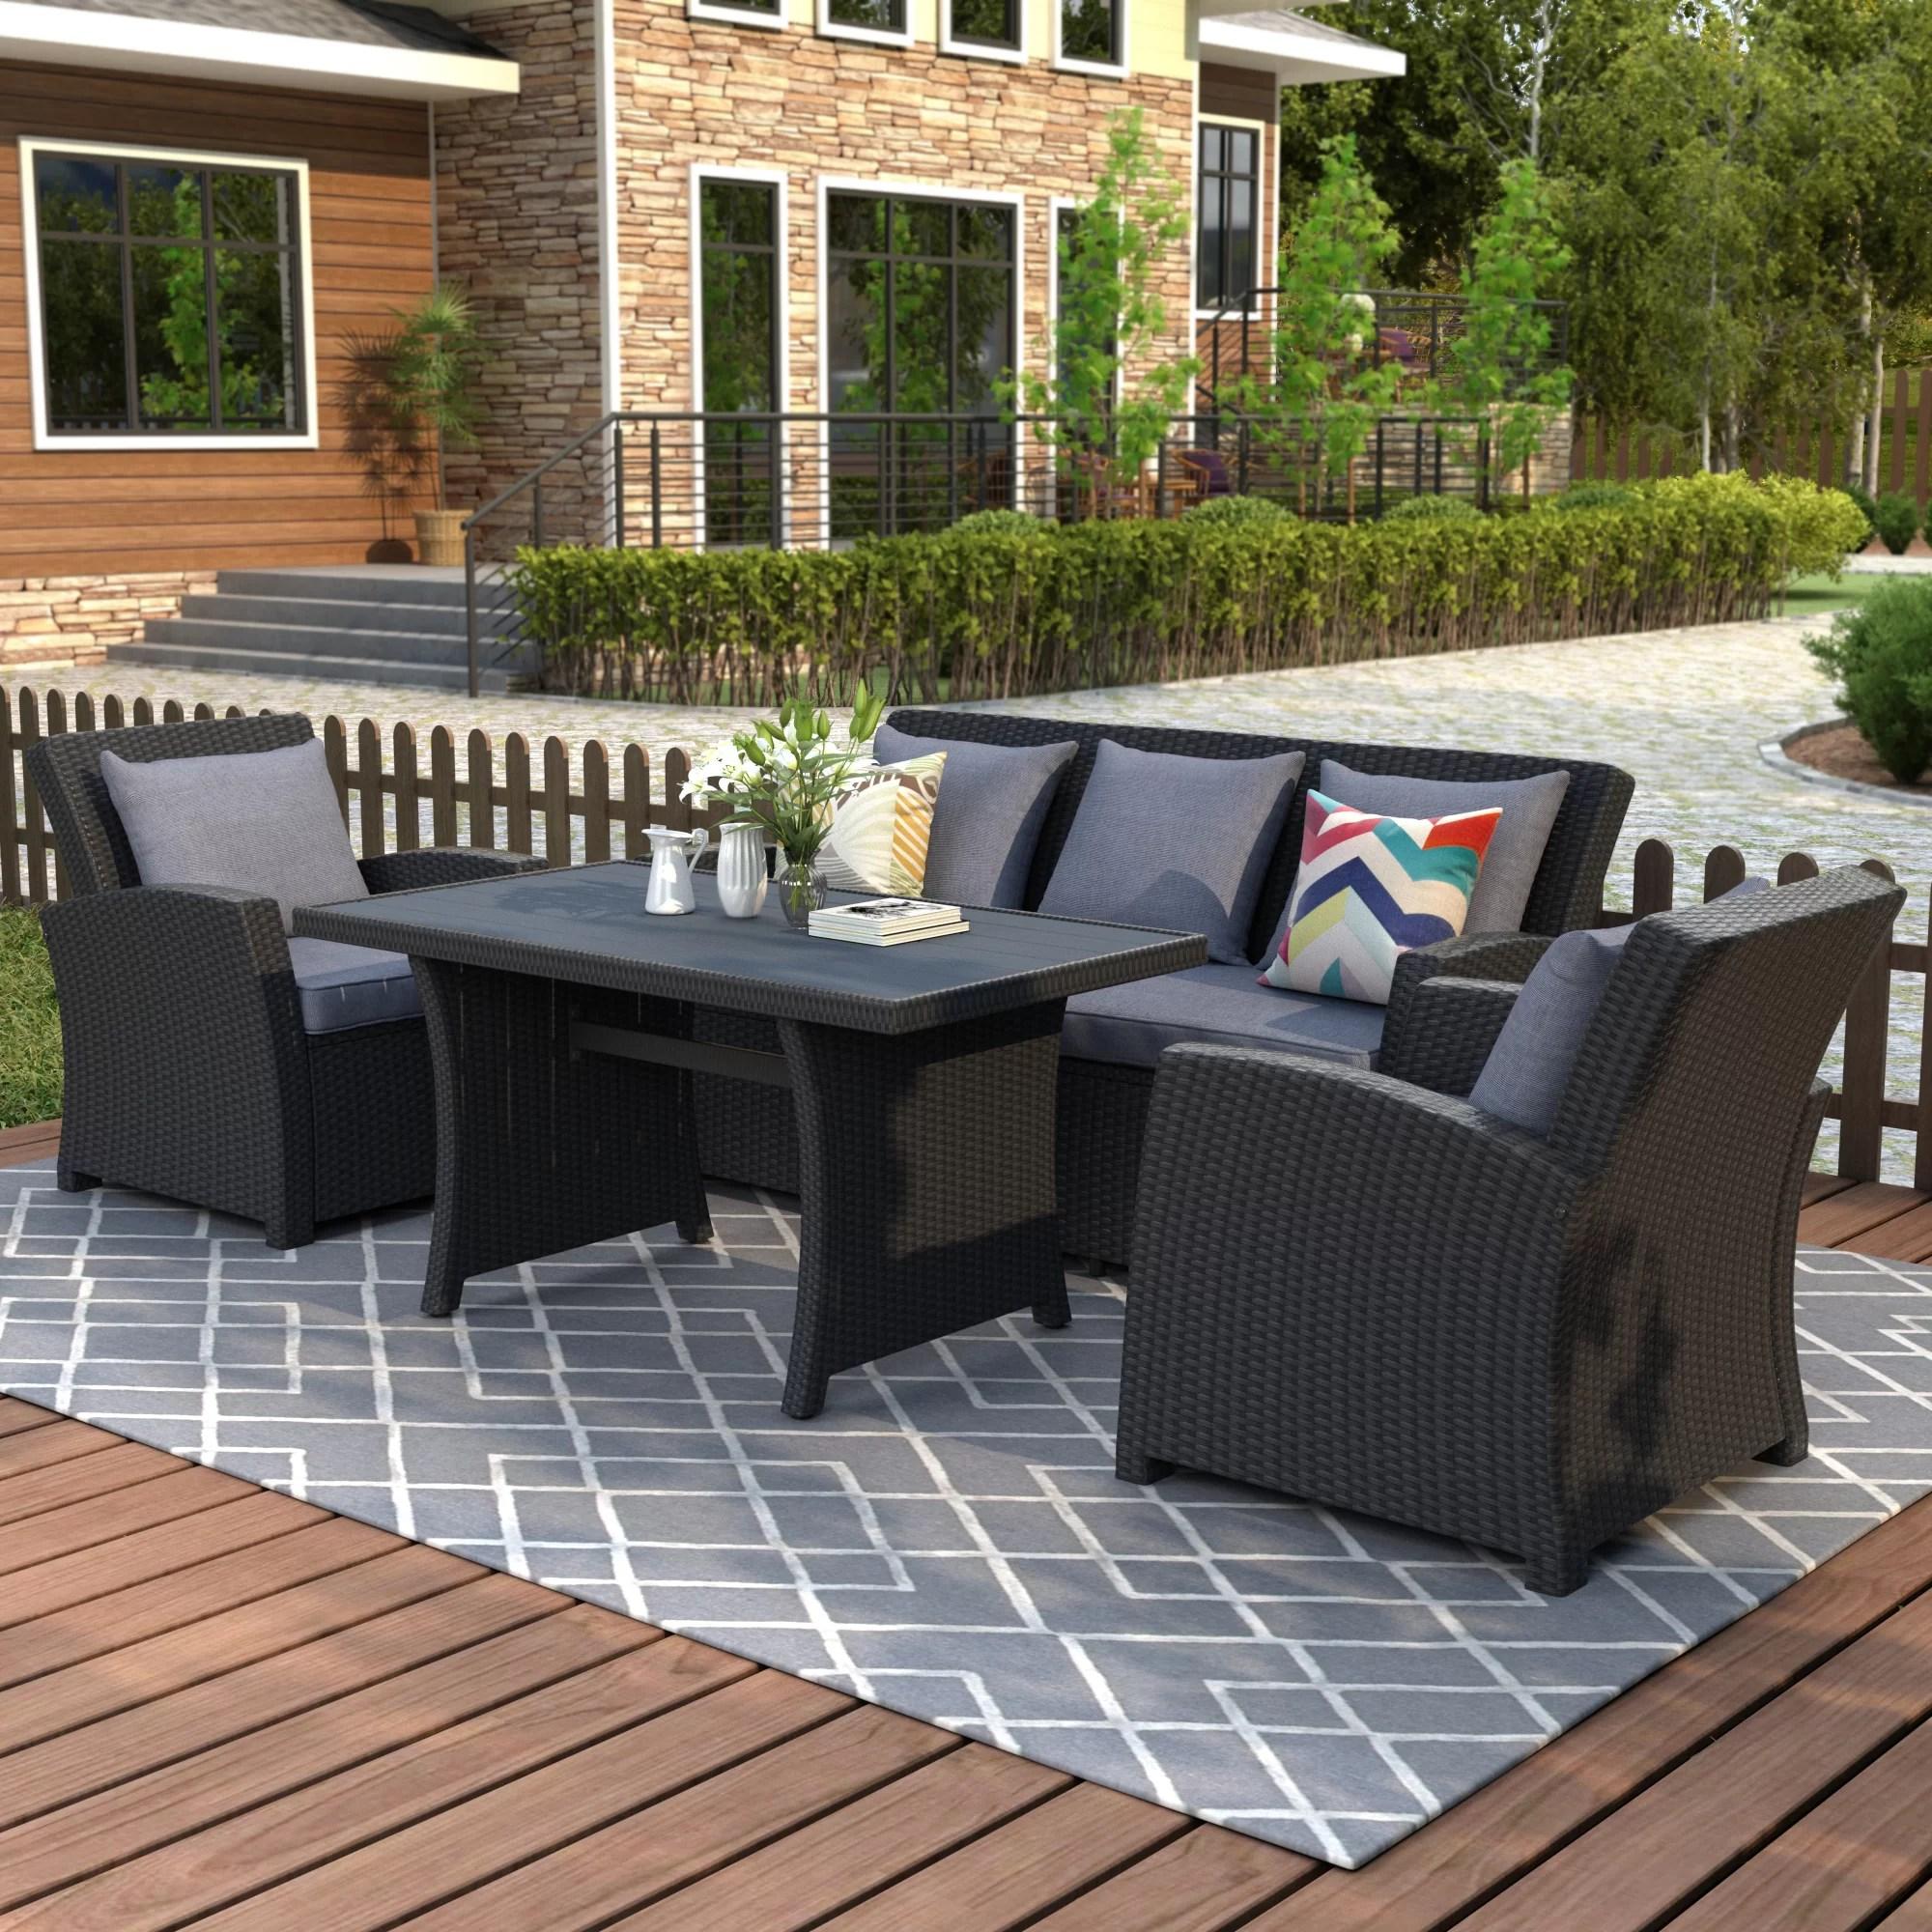 outdoor patio furniture set 4 piece conversation set black wicker furniture sofa set with dark grey cushions